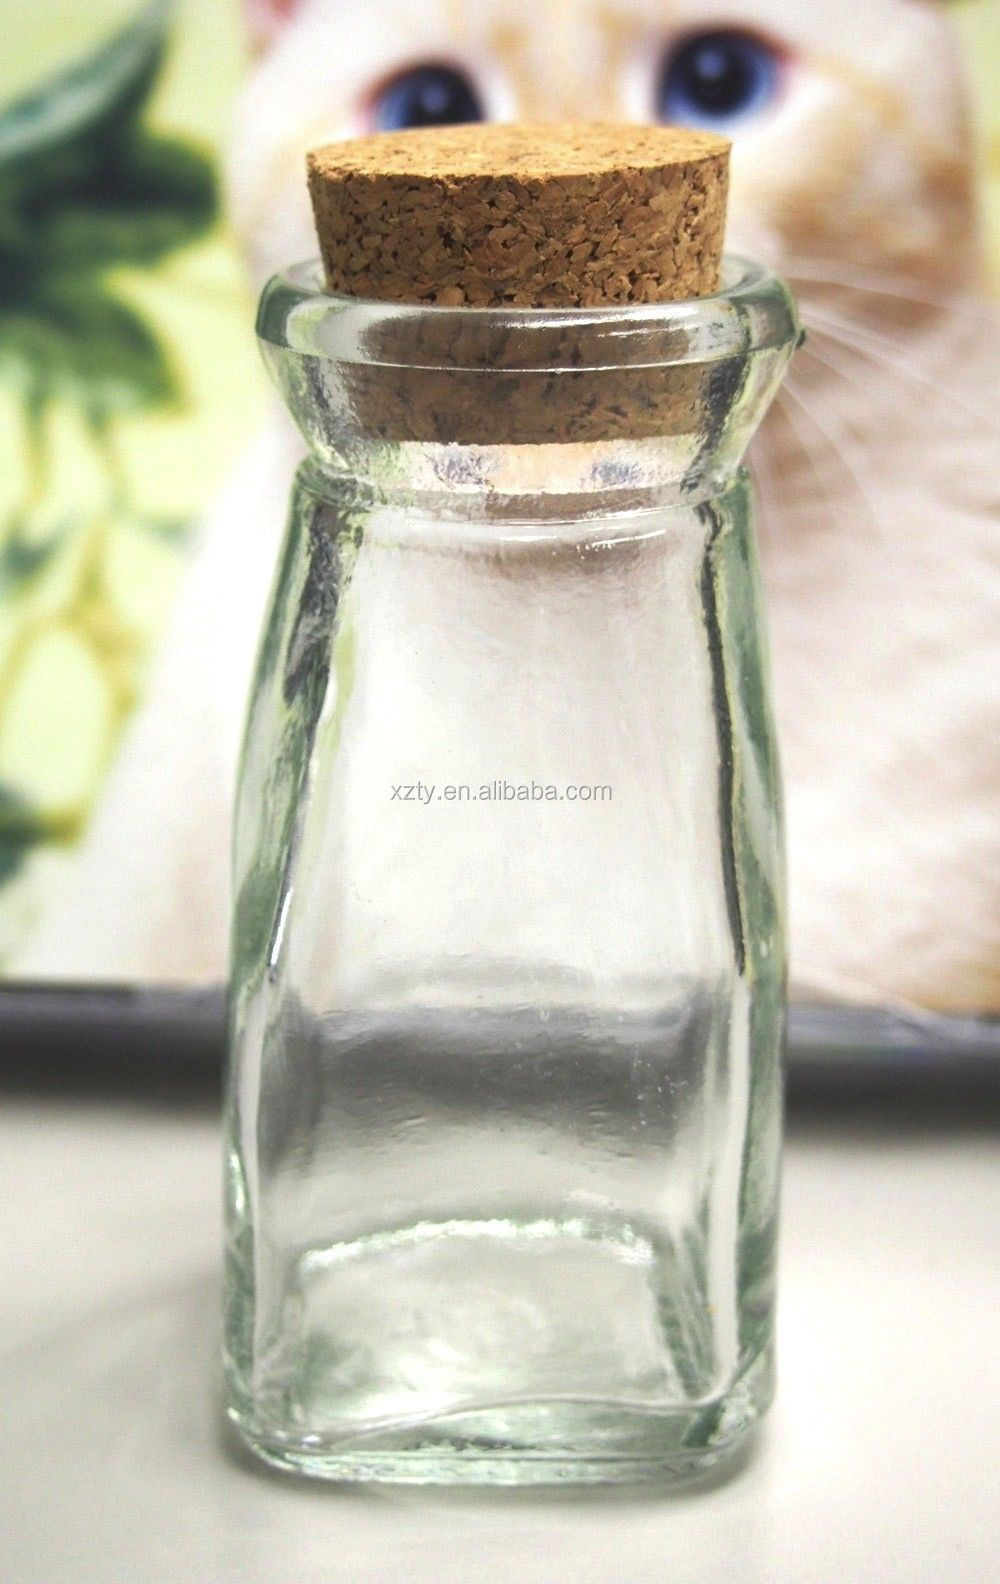 Mini Glass Favor Jars Bottle With Cork Keepsake Souvenir